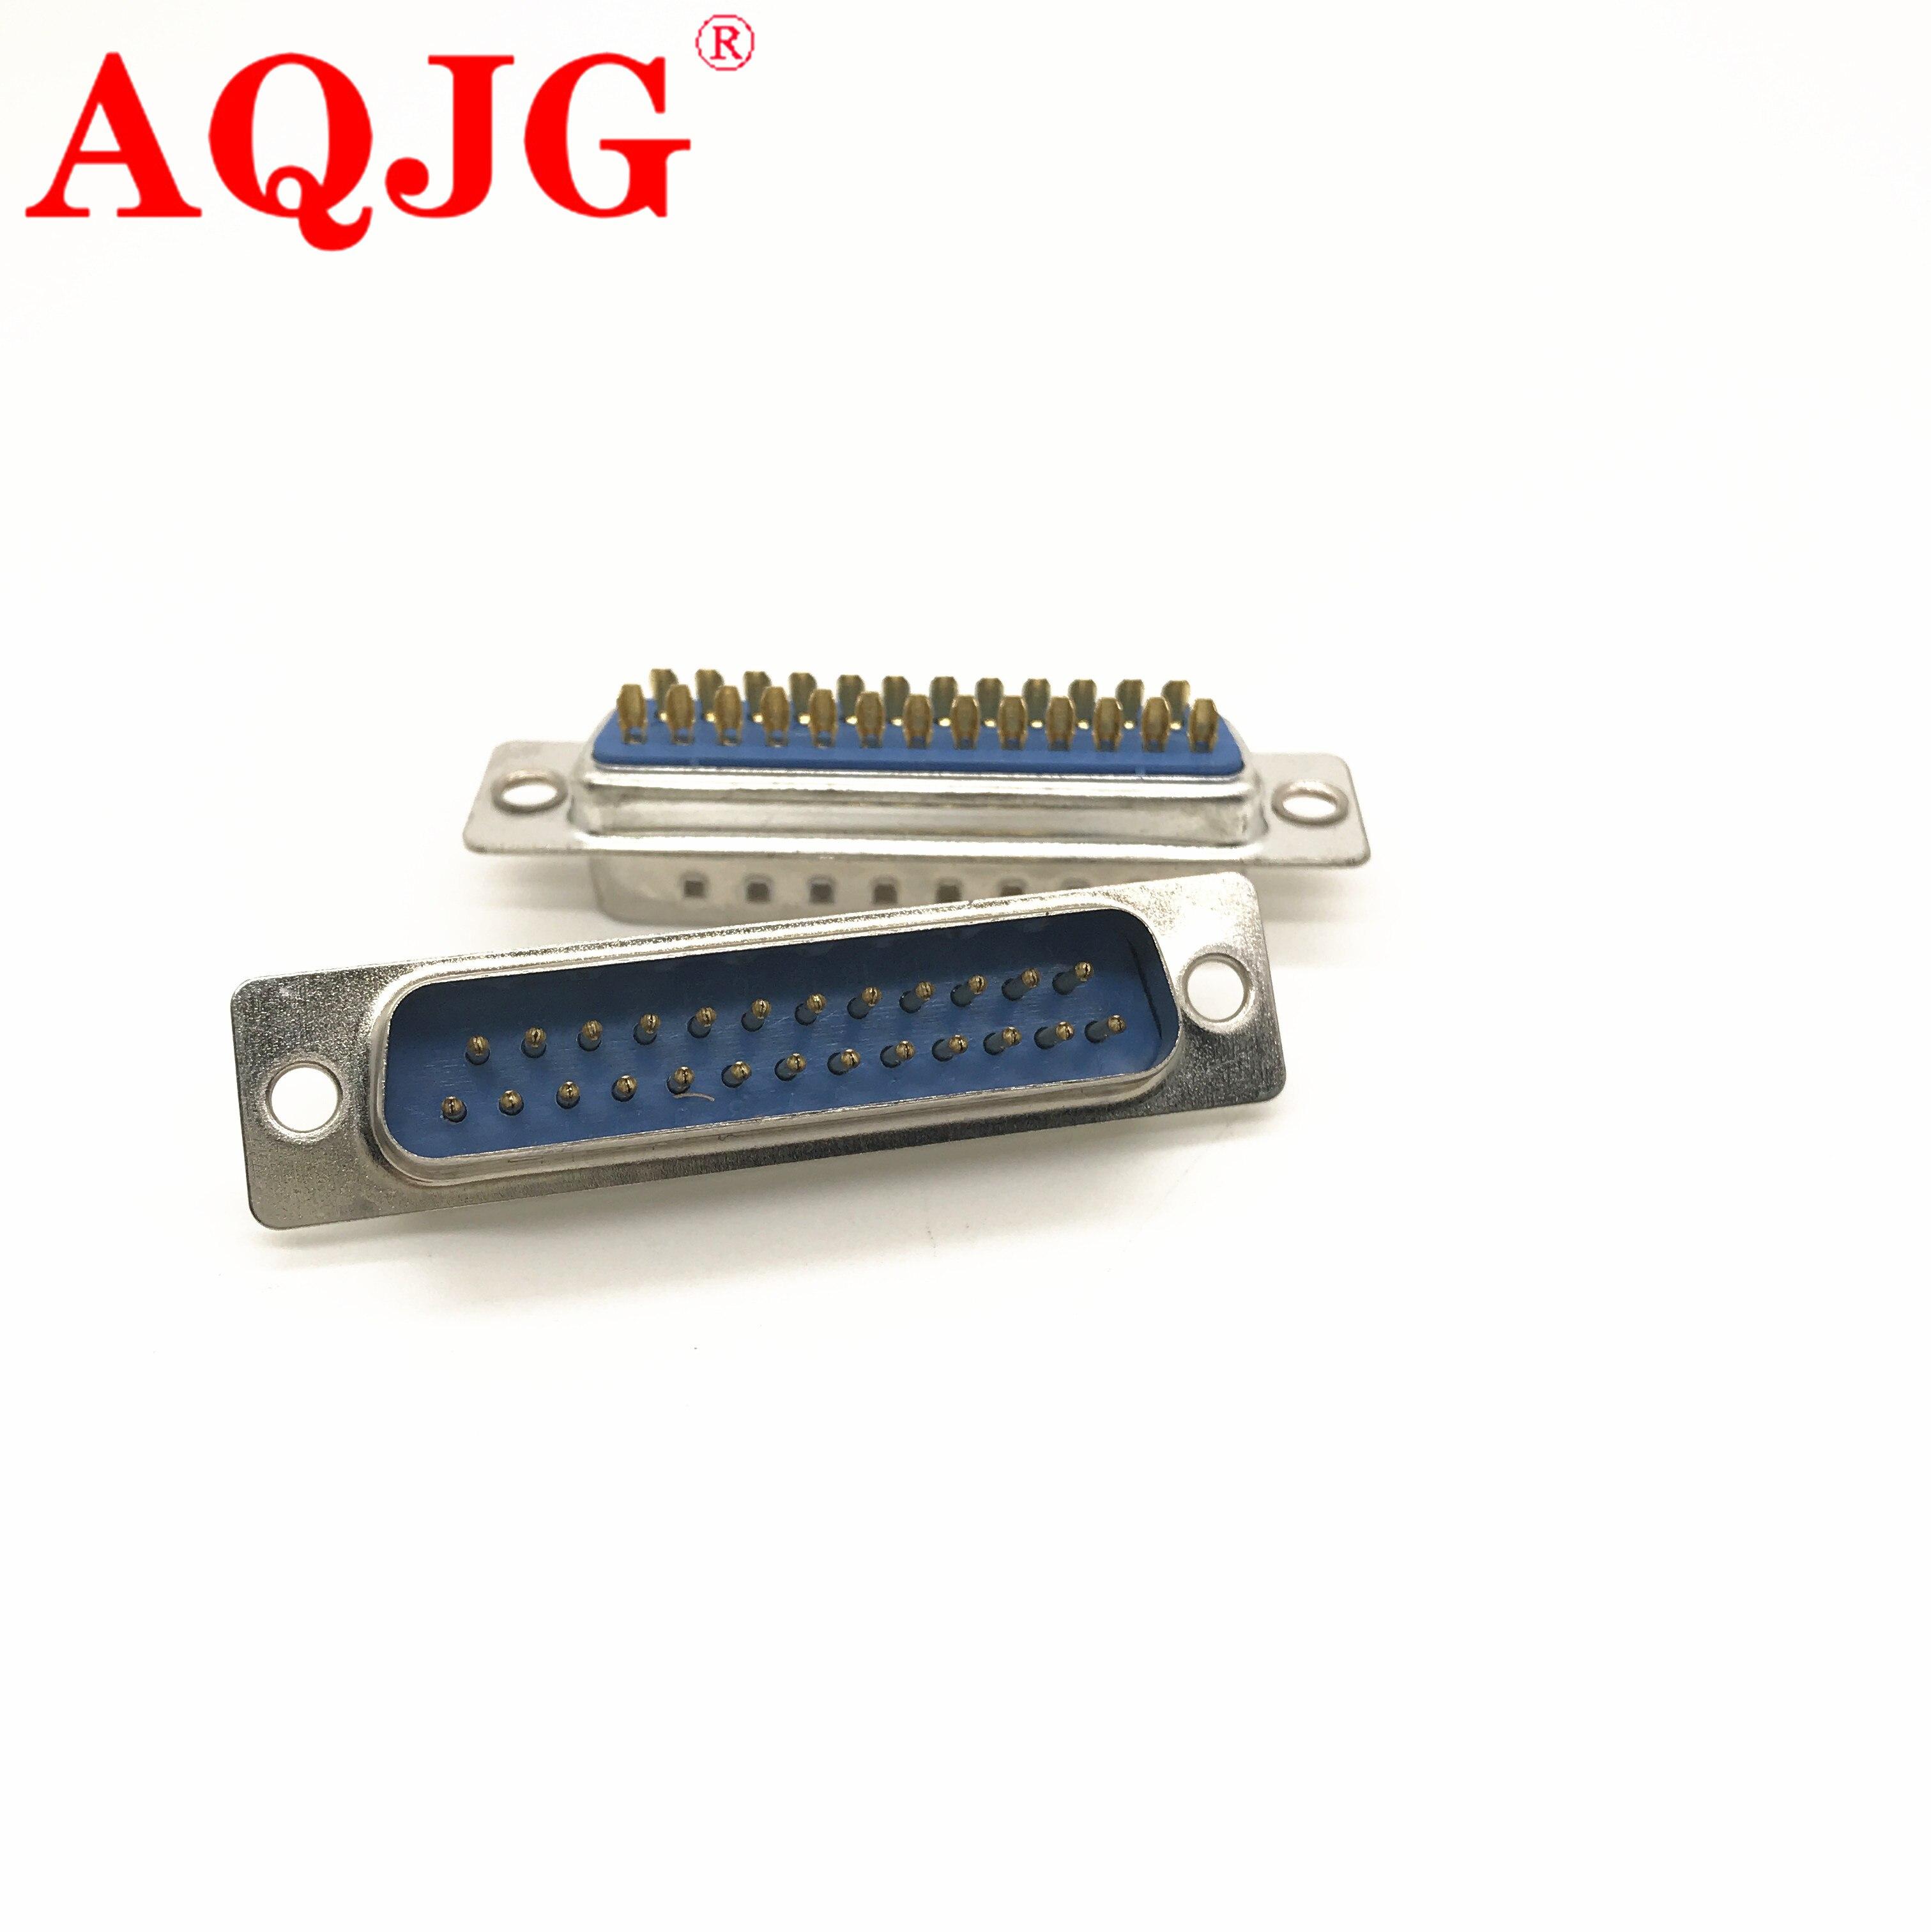 5 unids/lote 25 Pin D-SUB DB25 Pin hembra Tipo De Soldadura de soldadura conector